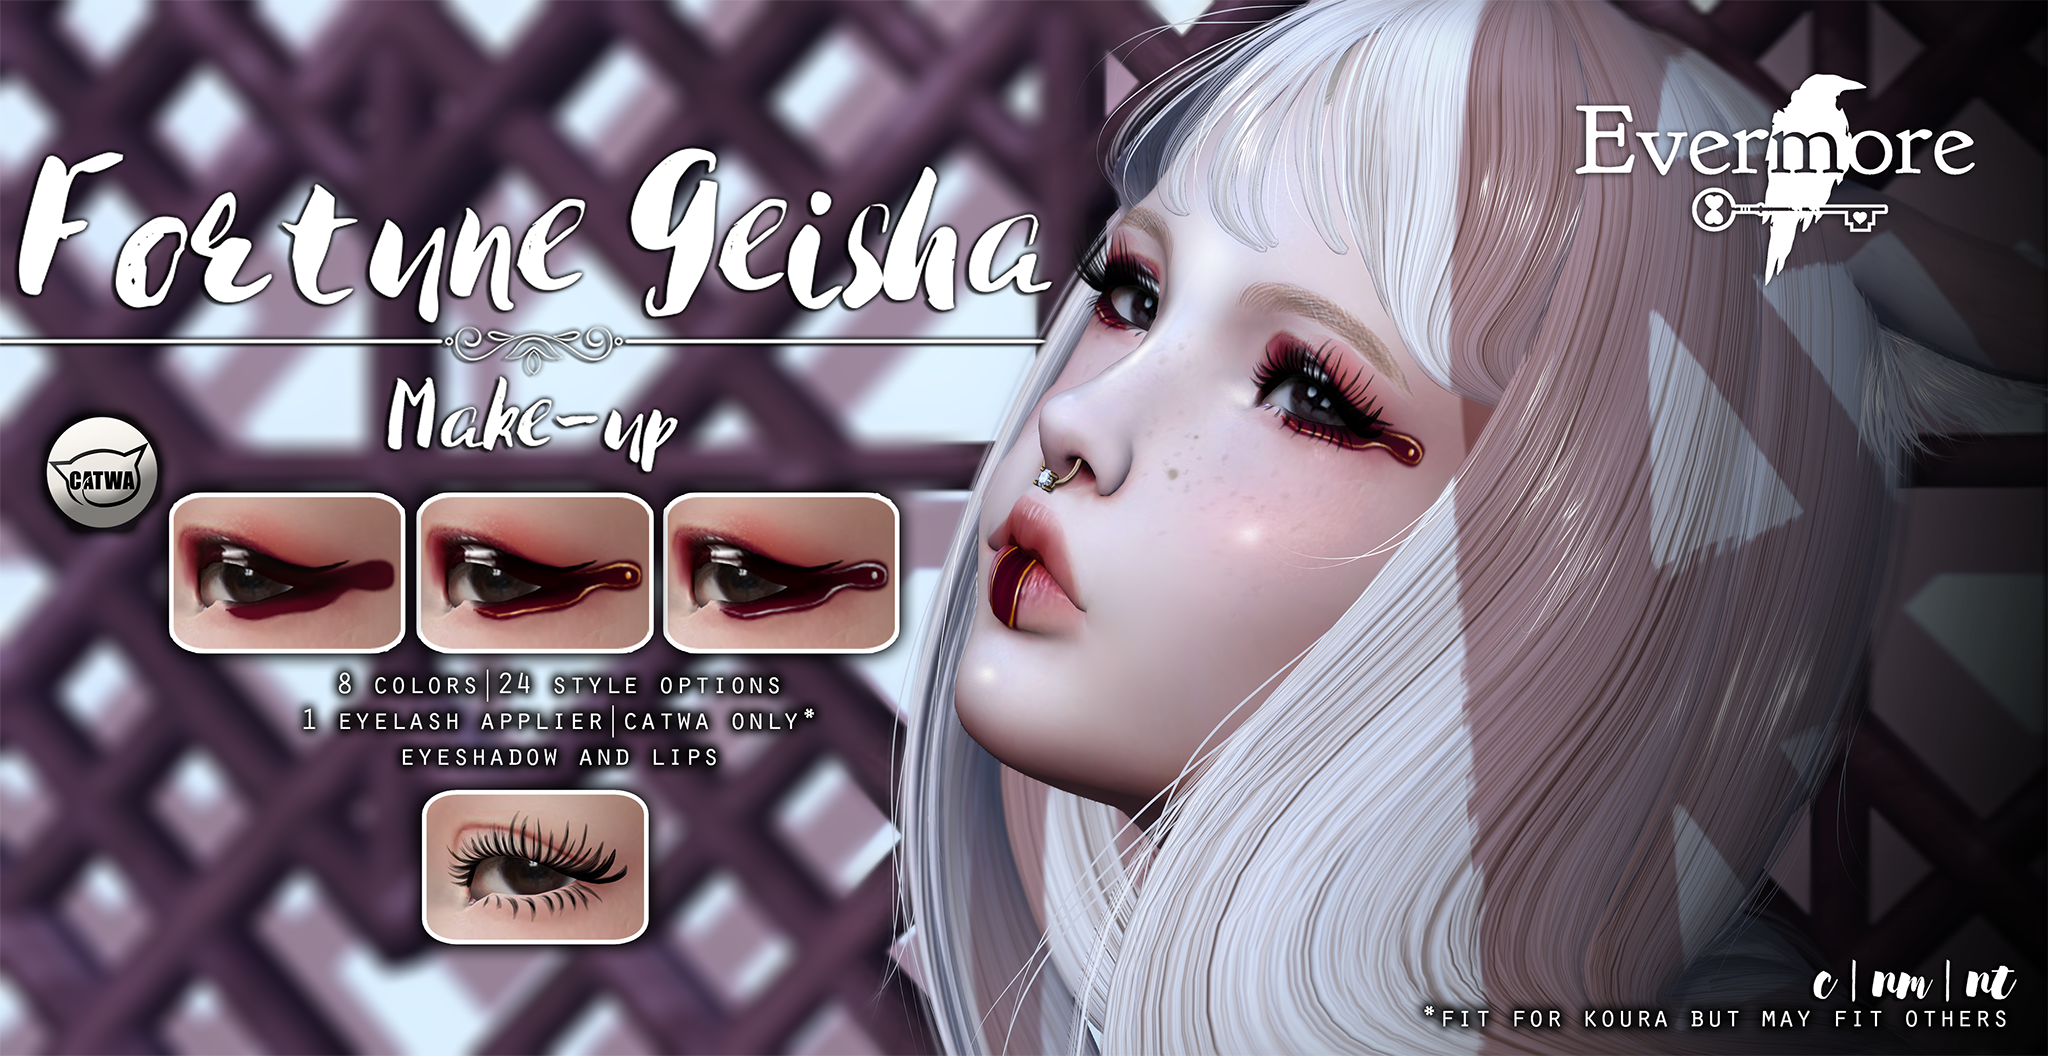 Evermore. Fortune Geisha